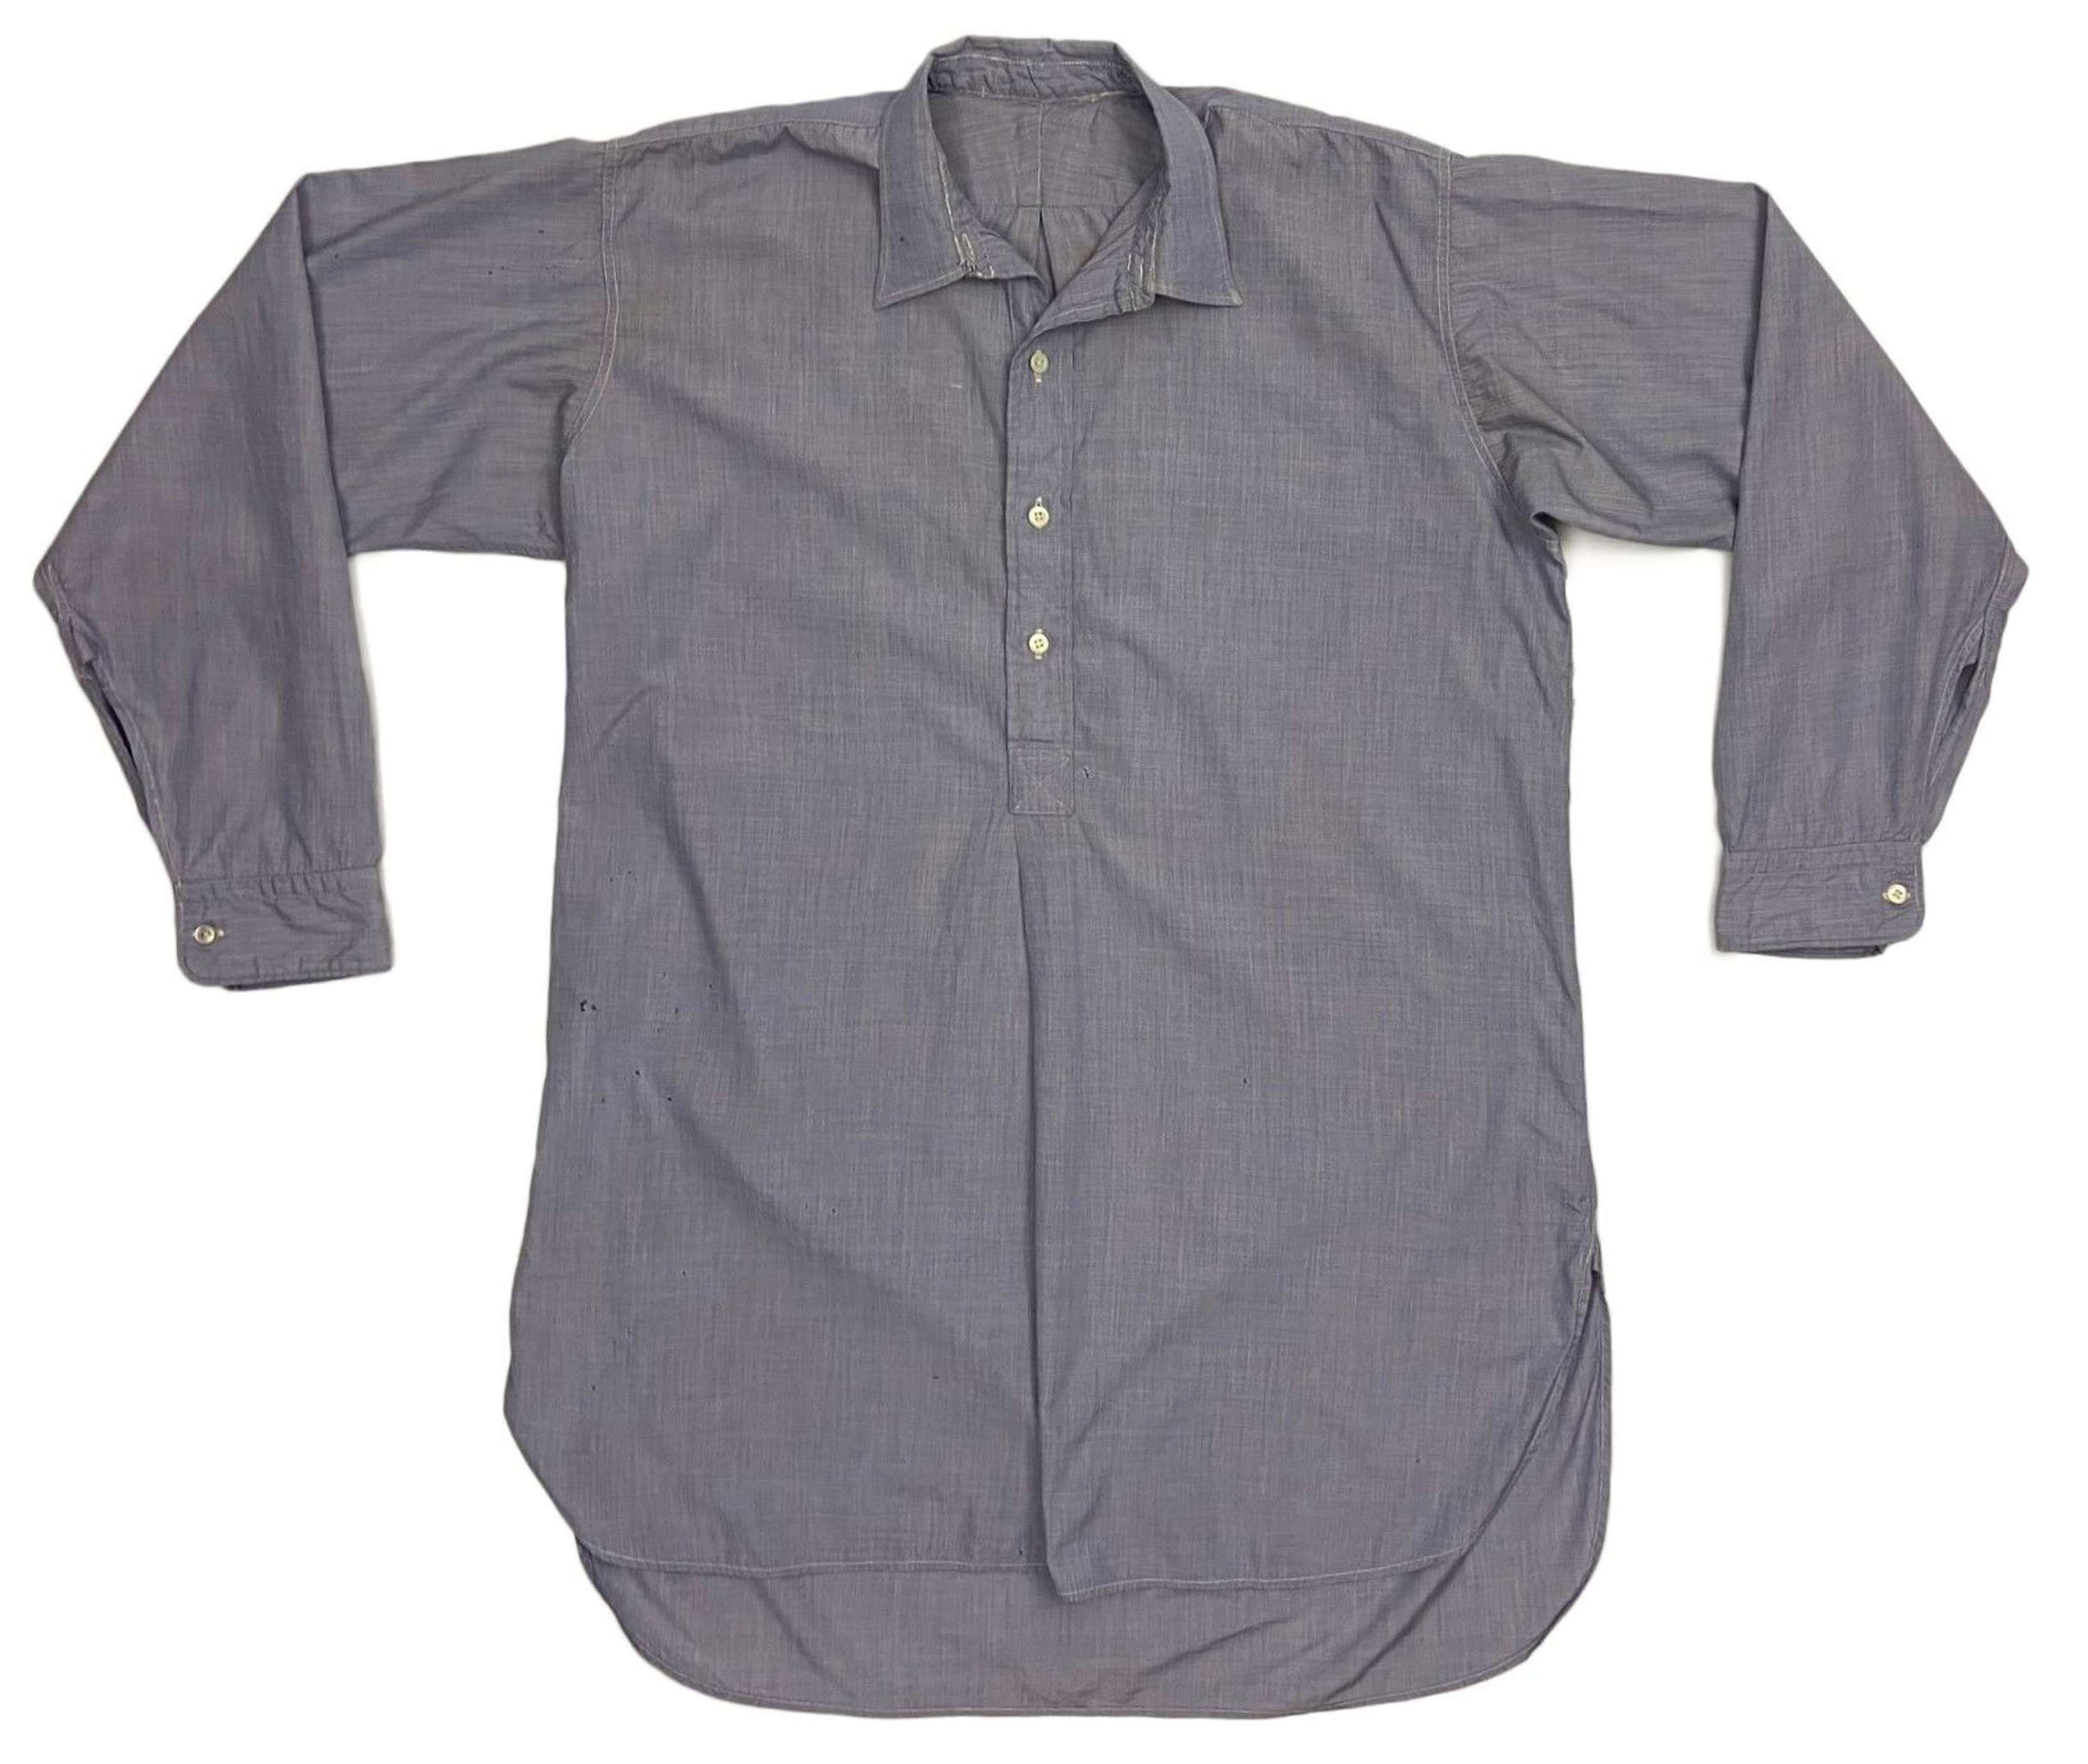 Original 1953 Dated RAF Officers Shirt - Size 15 1/2